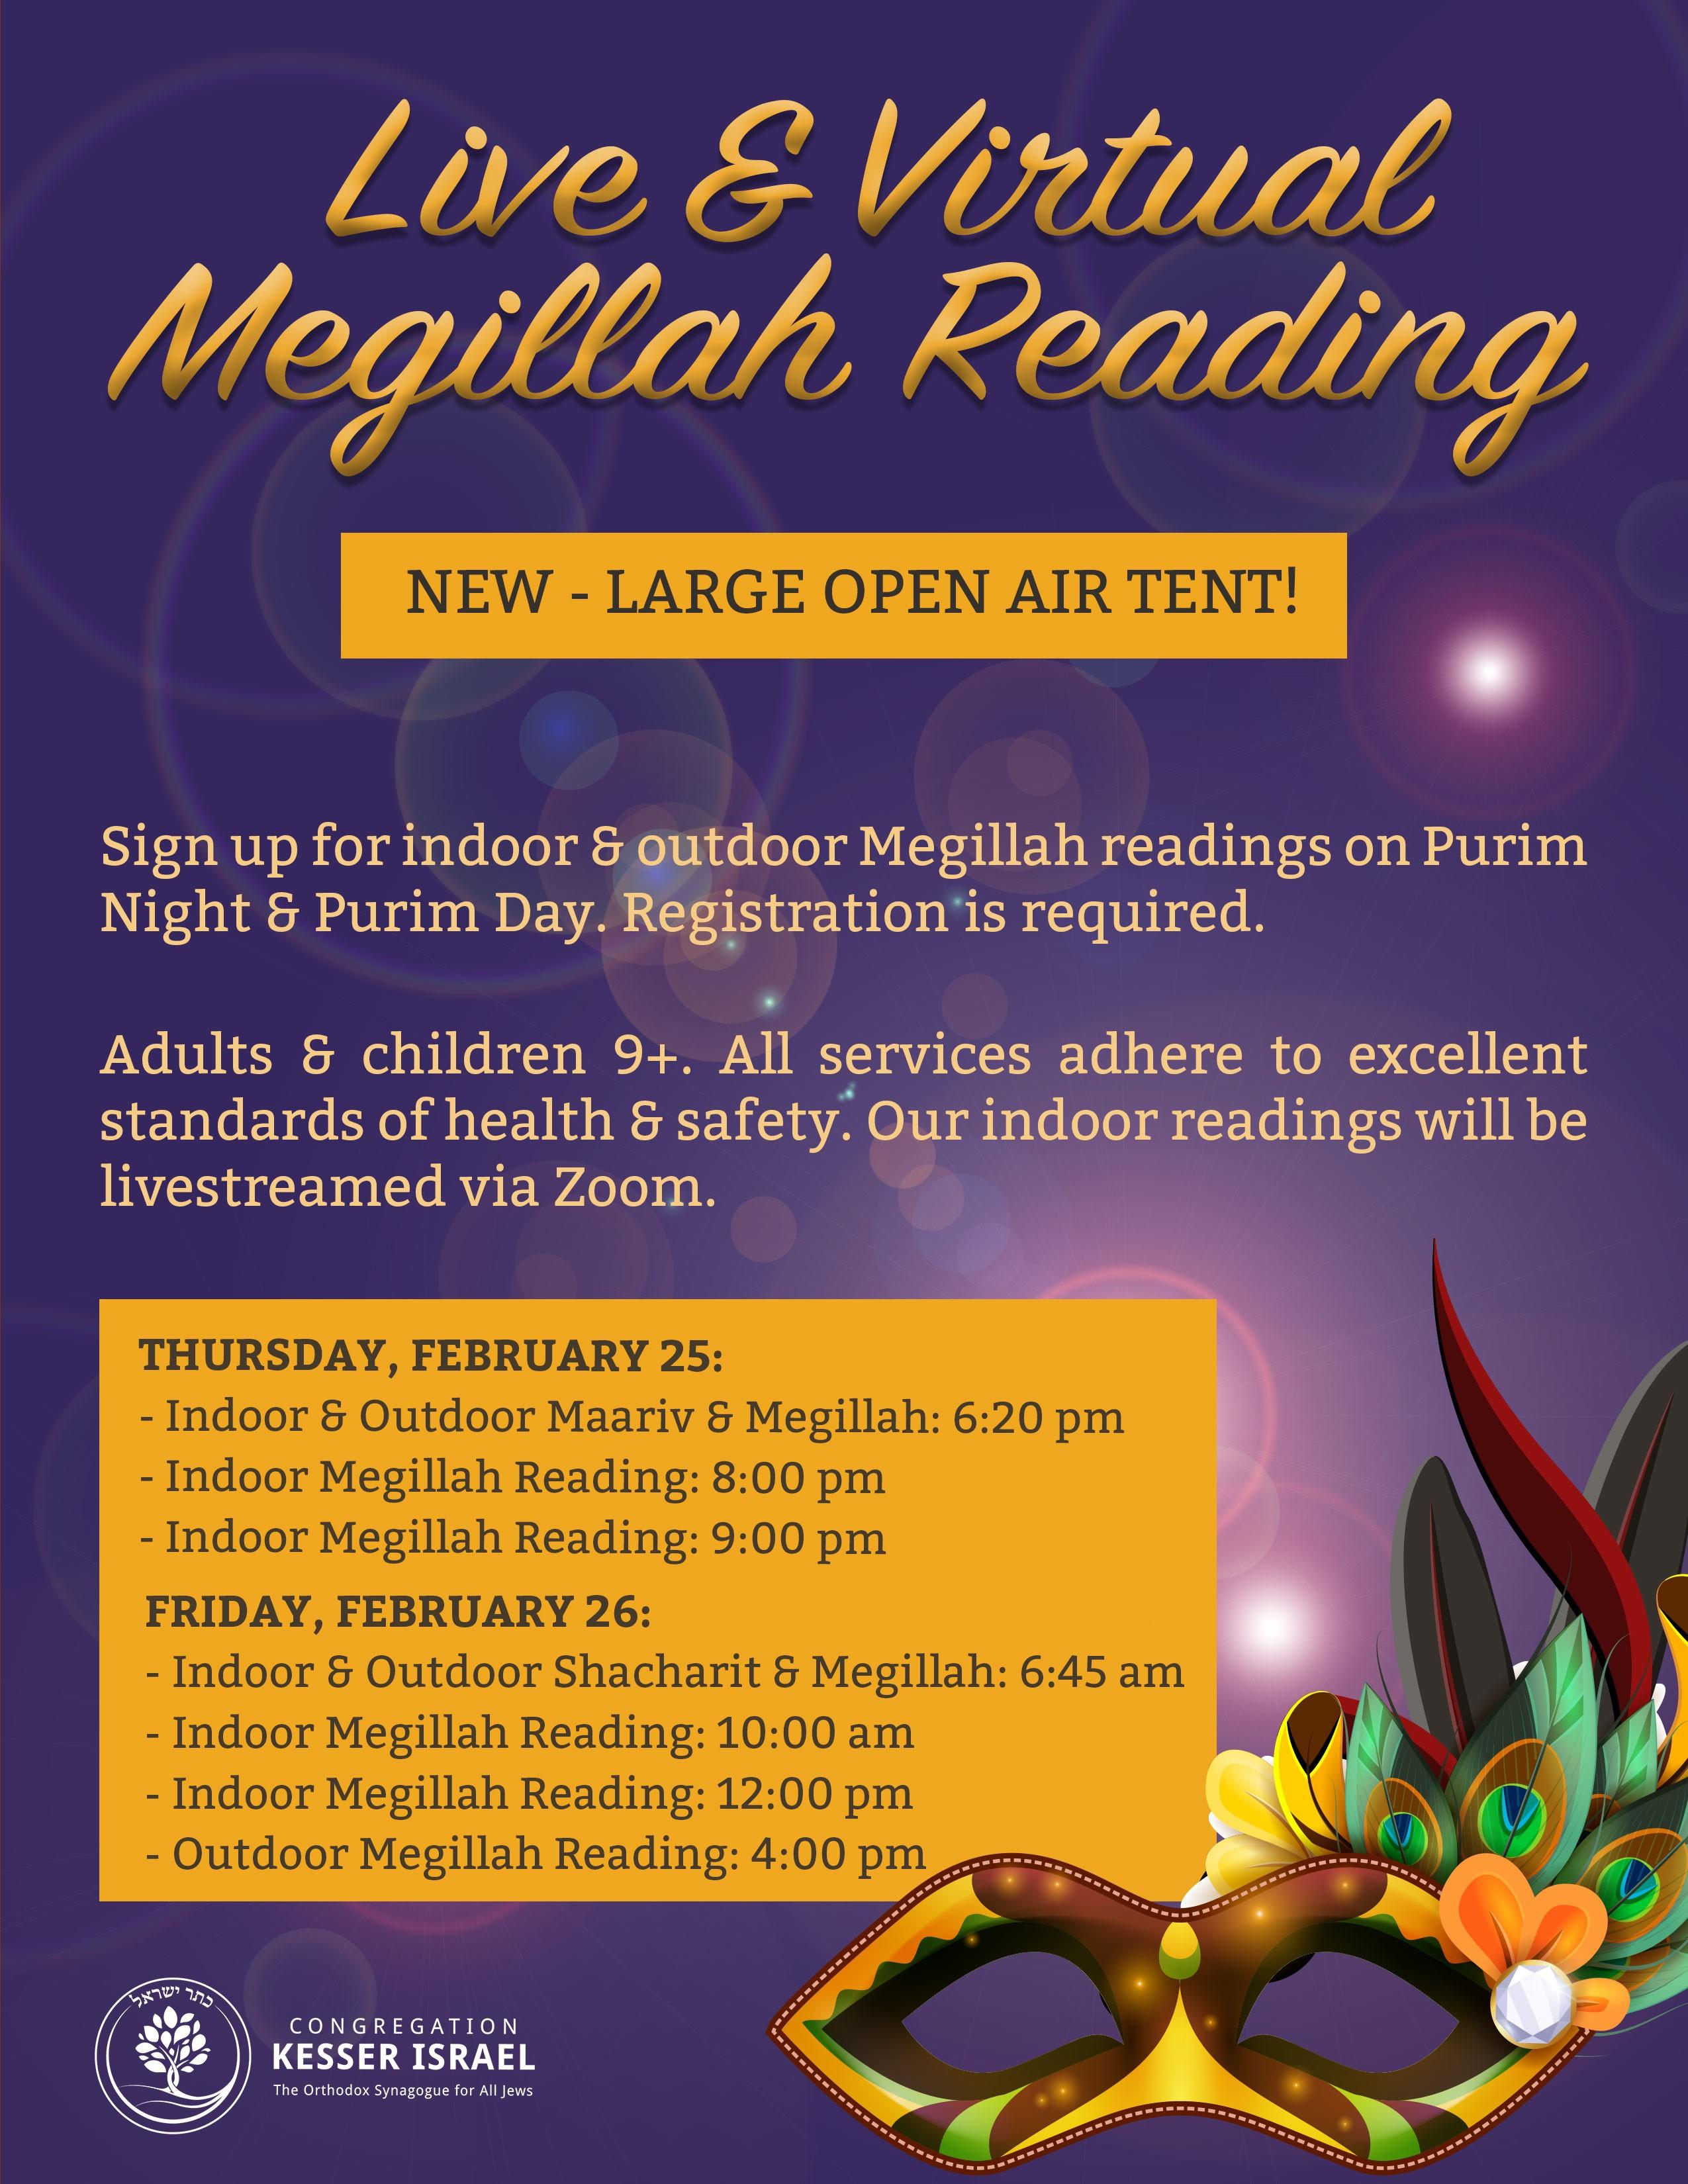 Banner Image for Live & Virtual Megillah Reading